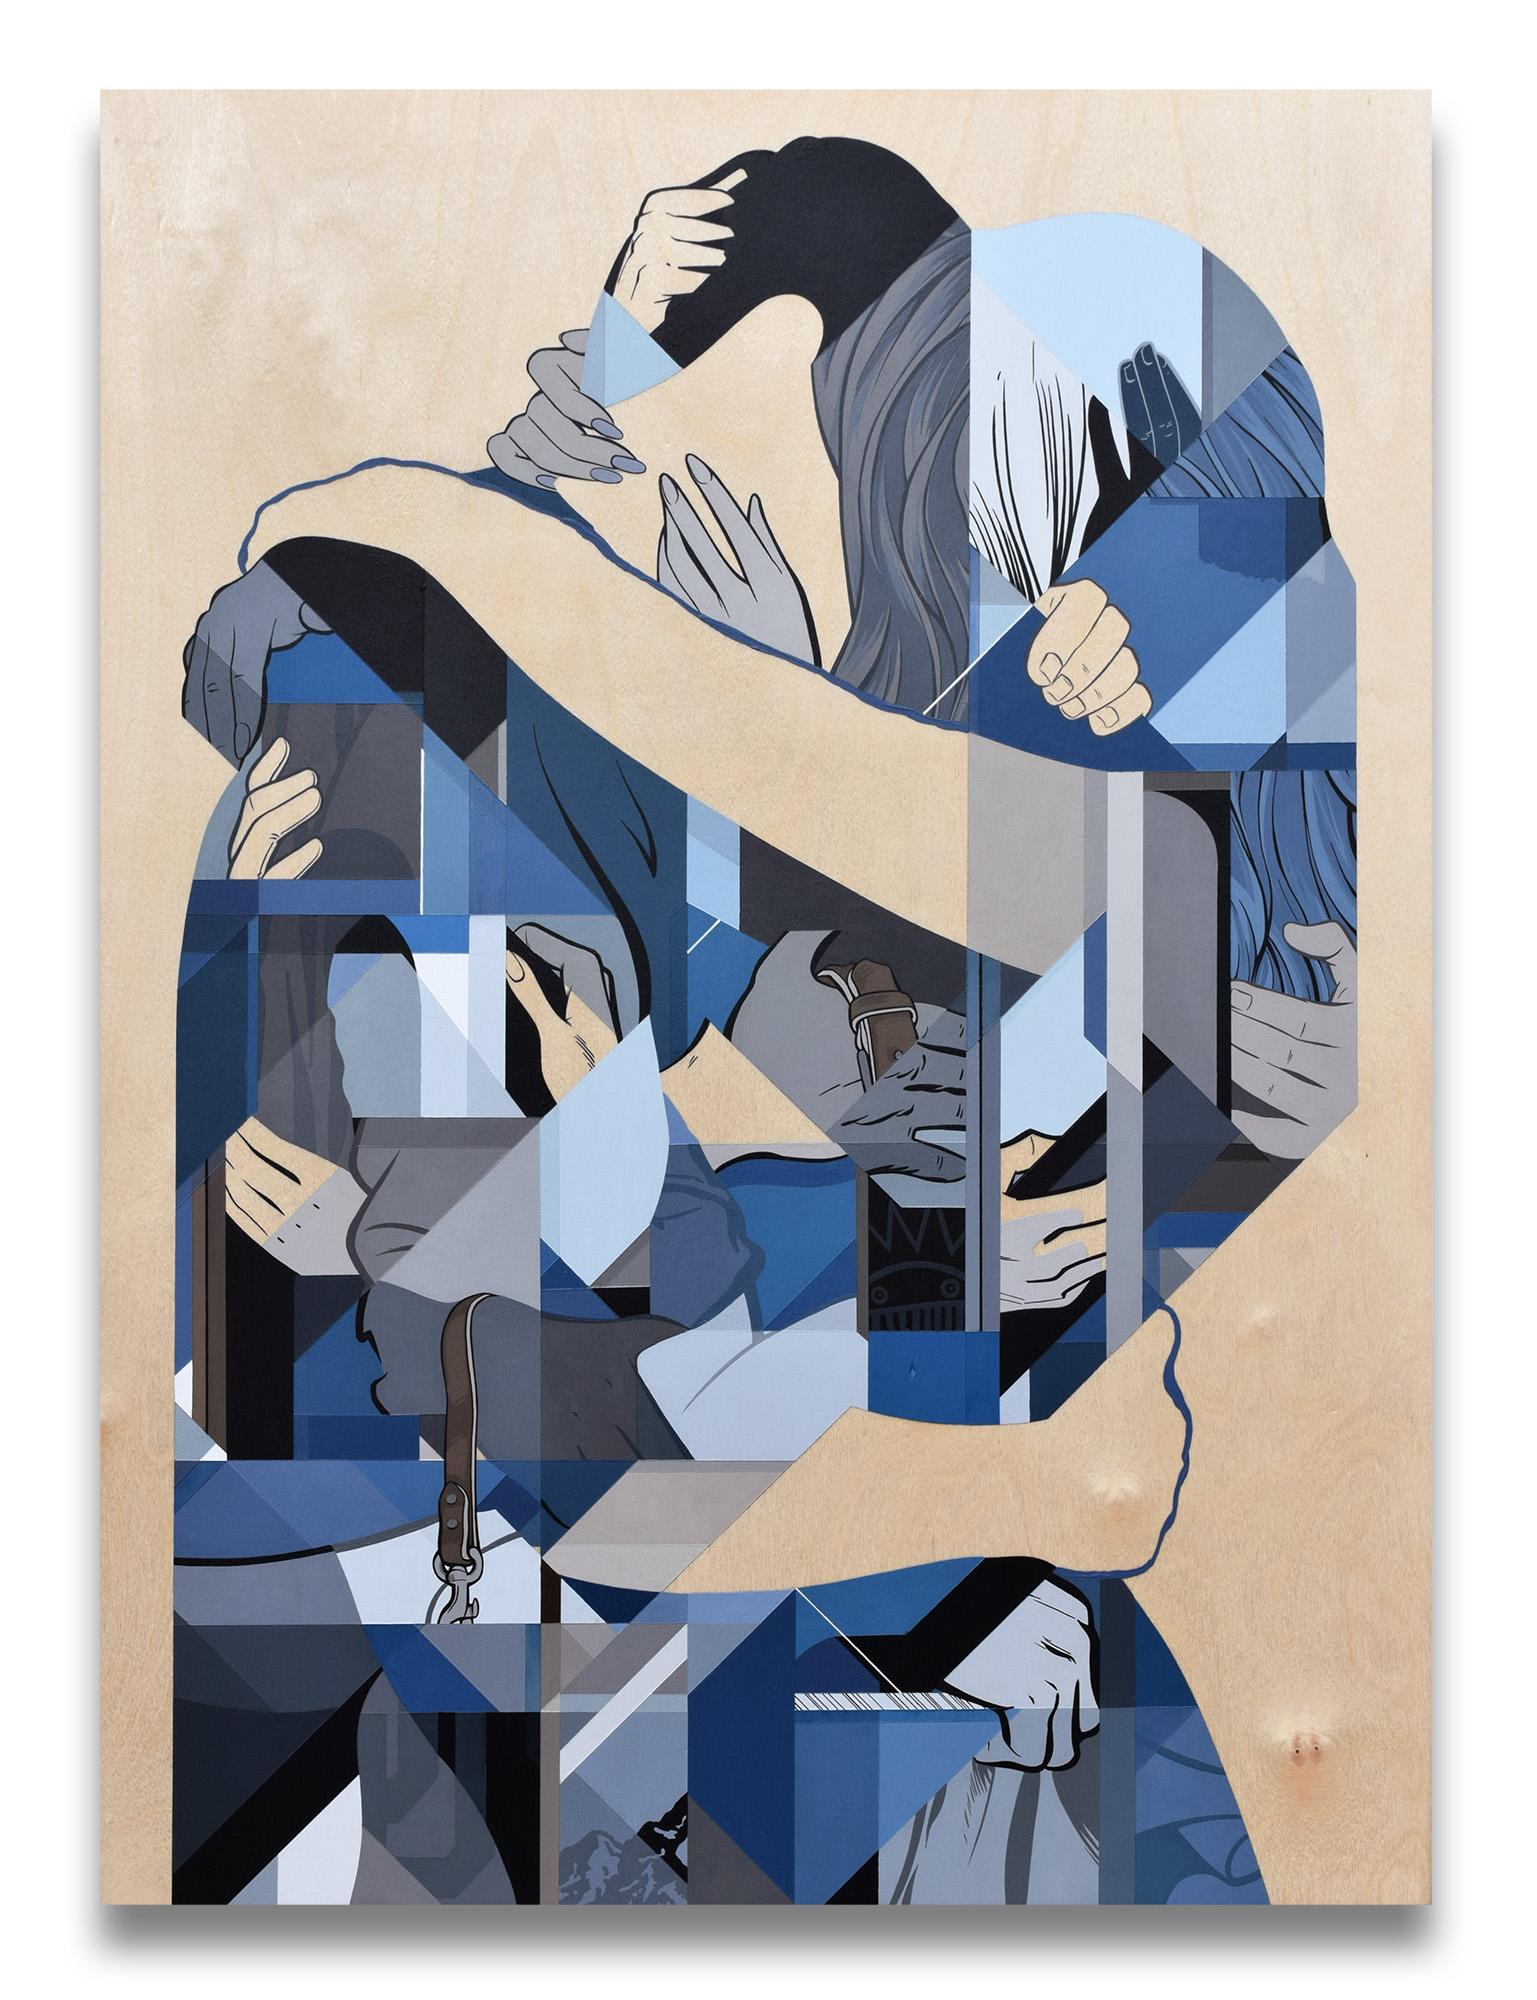 """Summer Skin 2"" 56cm x 76cm (22"" x 30"") Acrylic painting on birch panel."